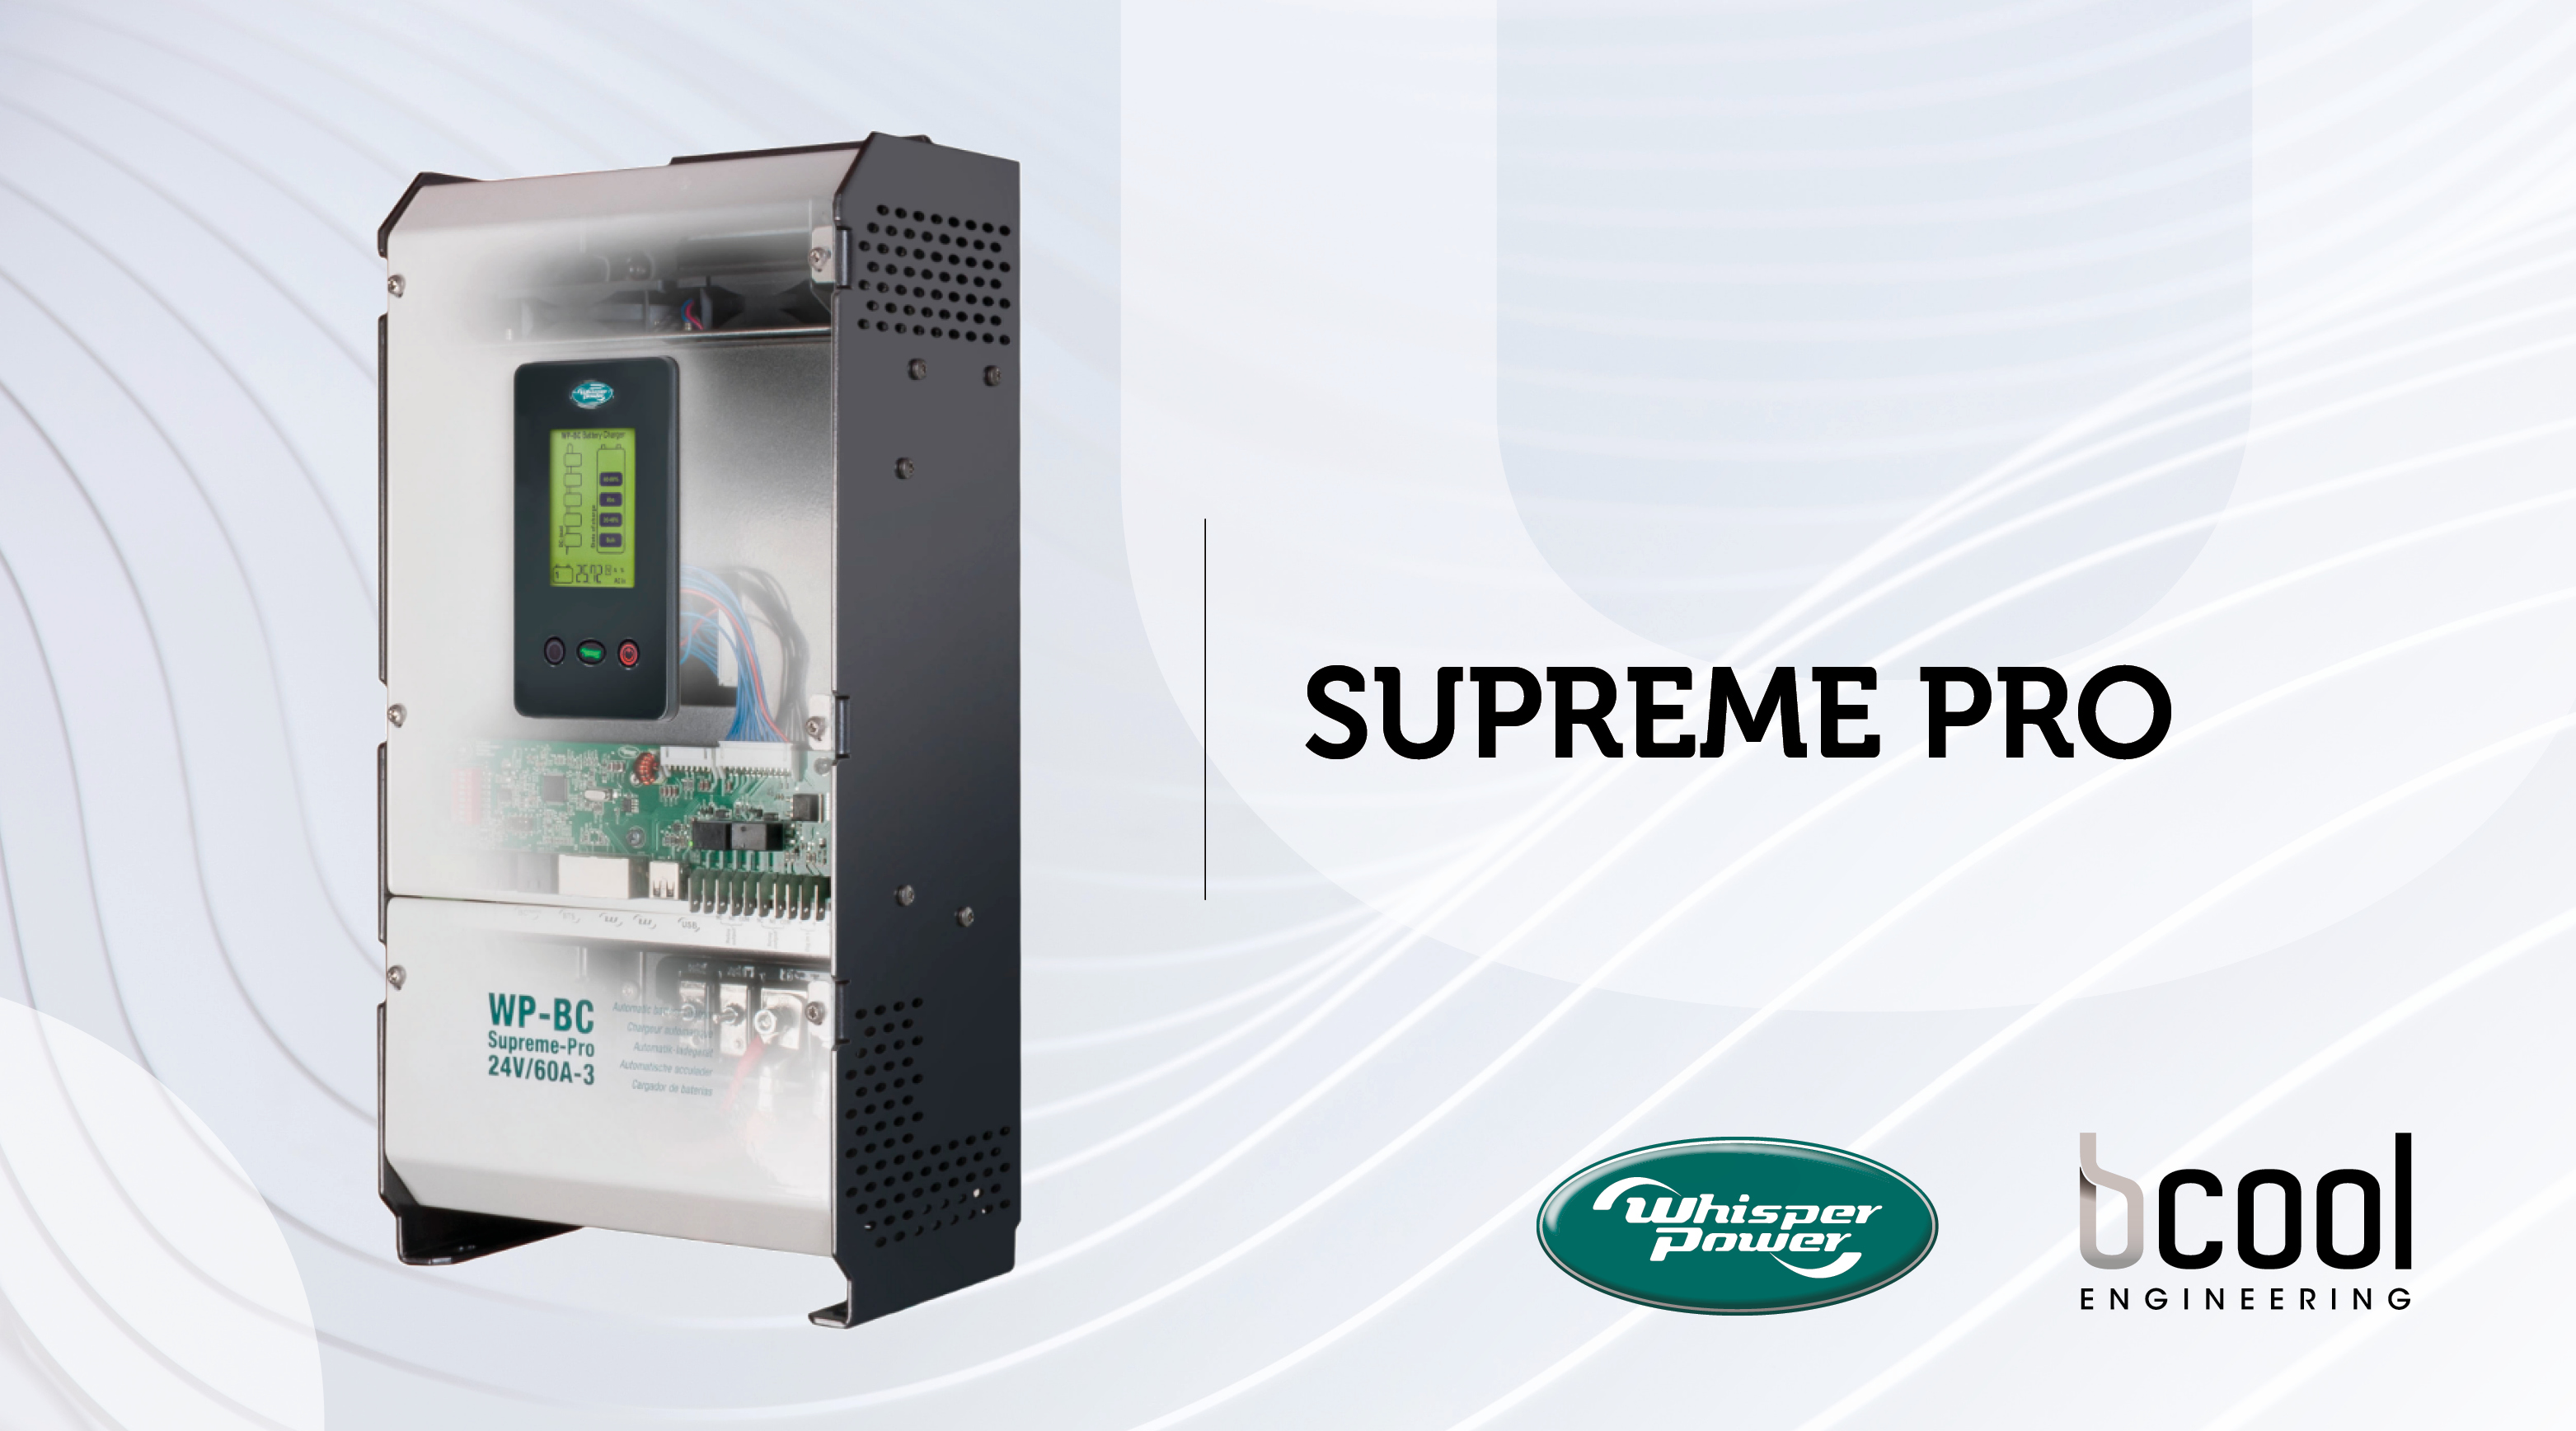 WhisperPower - Supreme Pro